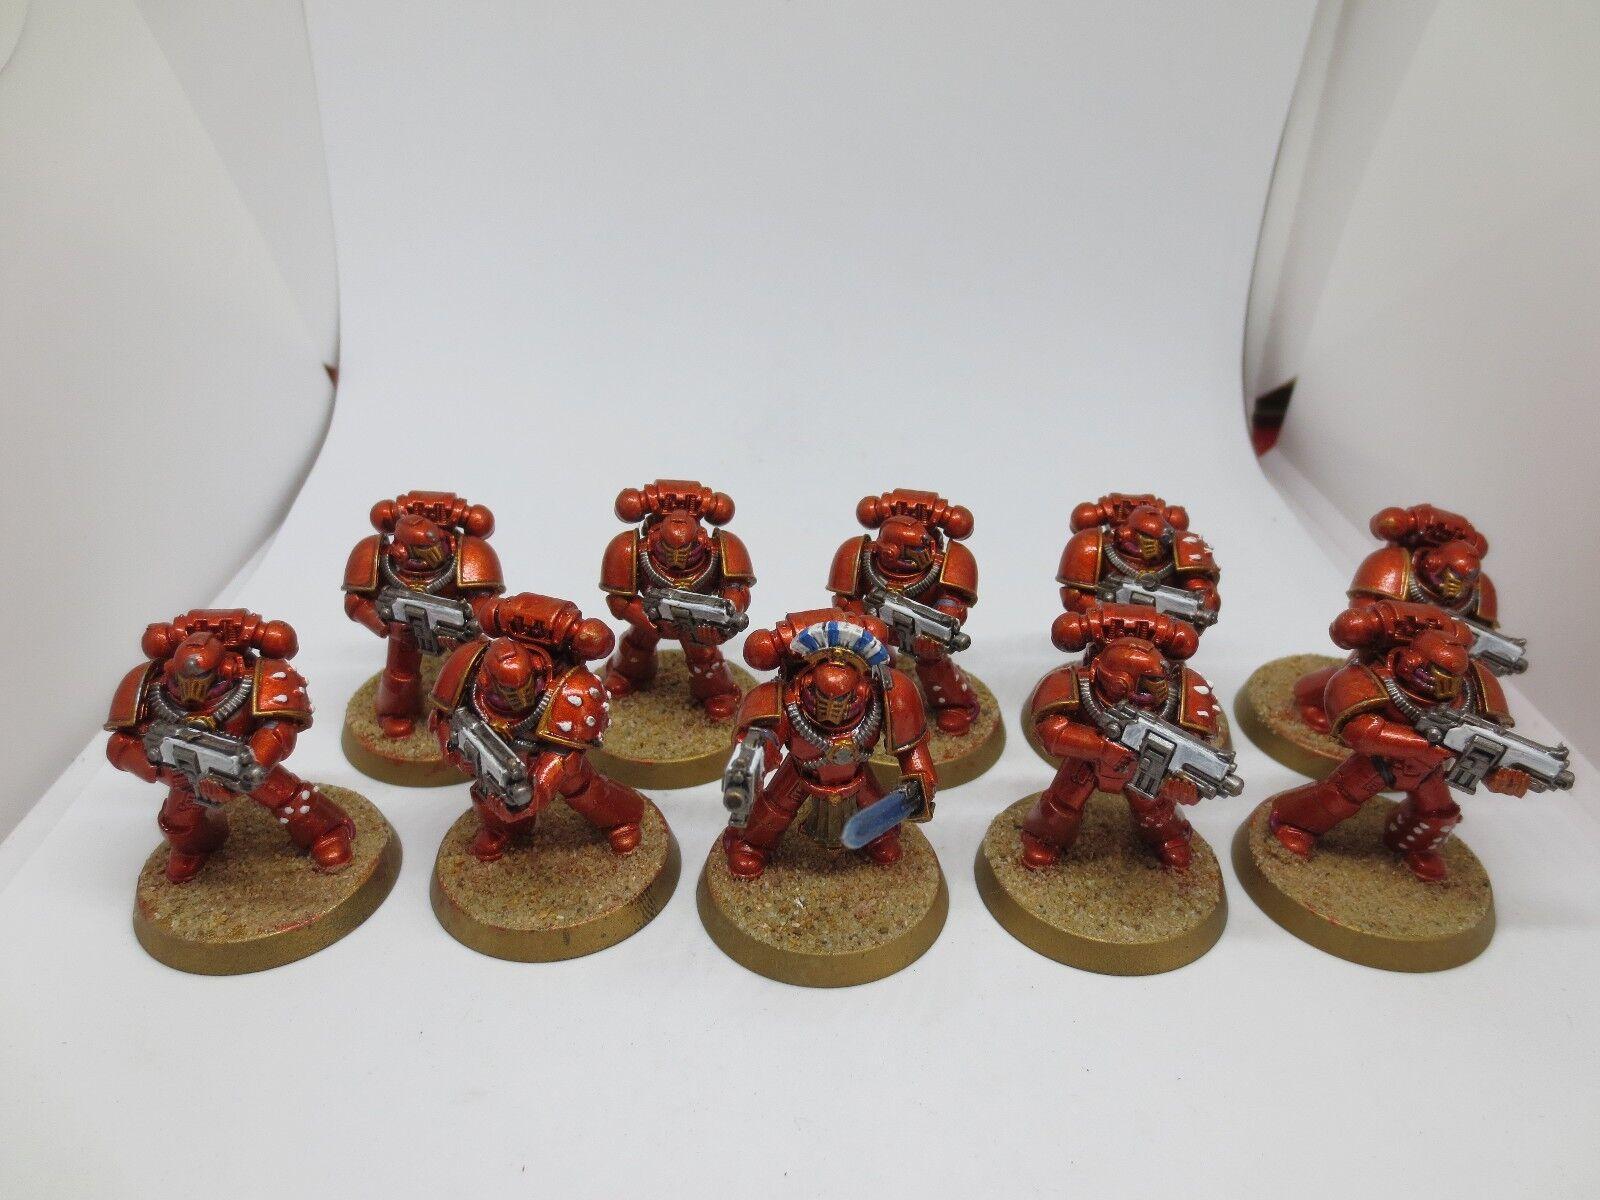 Warhammer 40K  The Horus Heresy Mark IV Space Marines Squad Painted G117